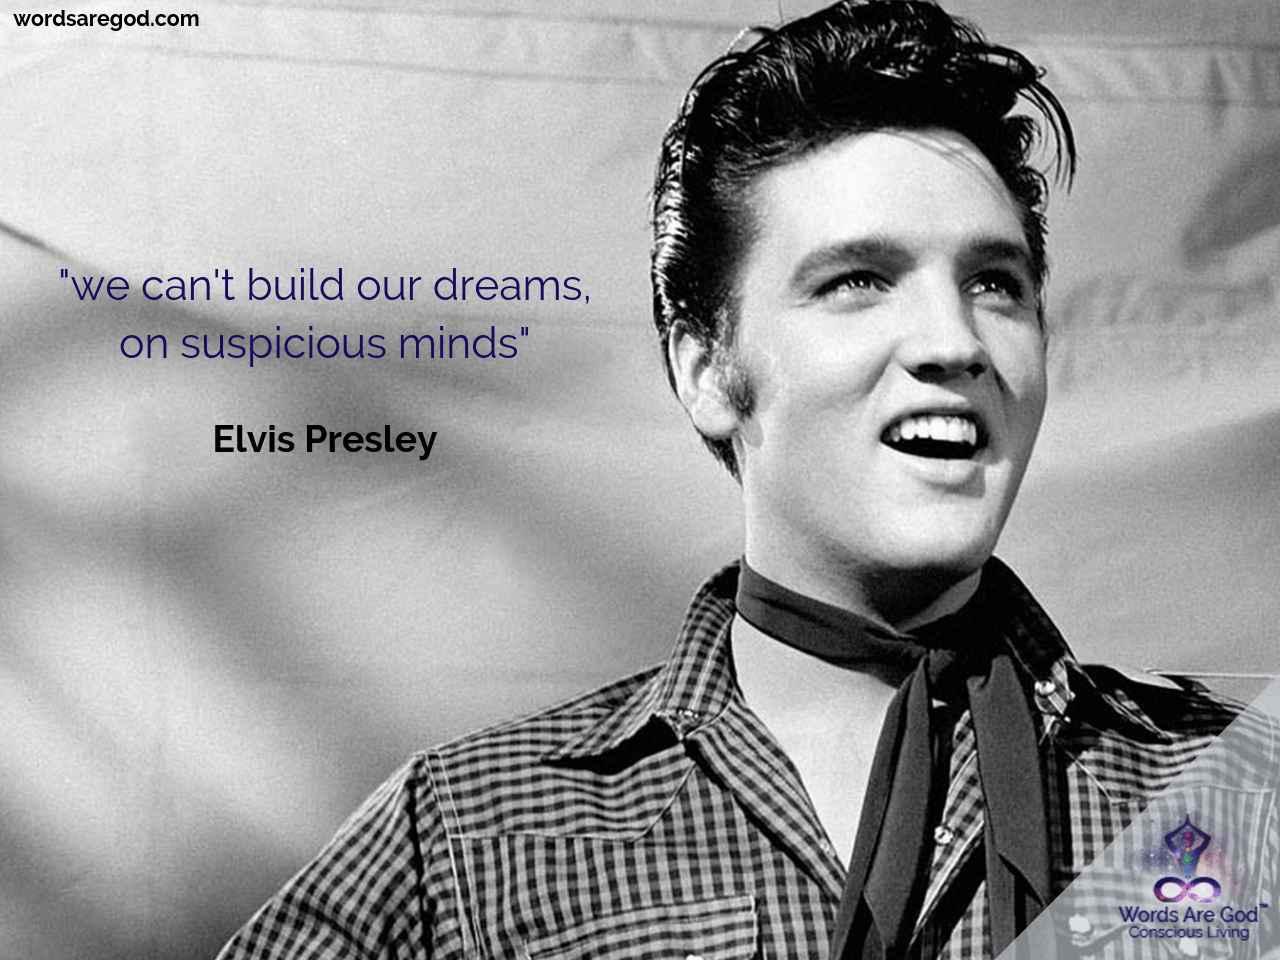 Elvis Presley Inspirational Quote by Elvis Presley